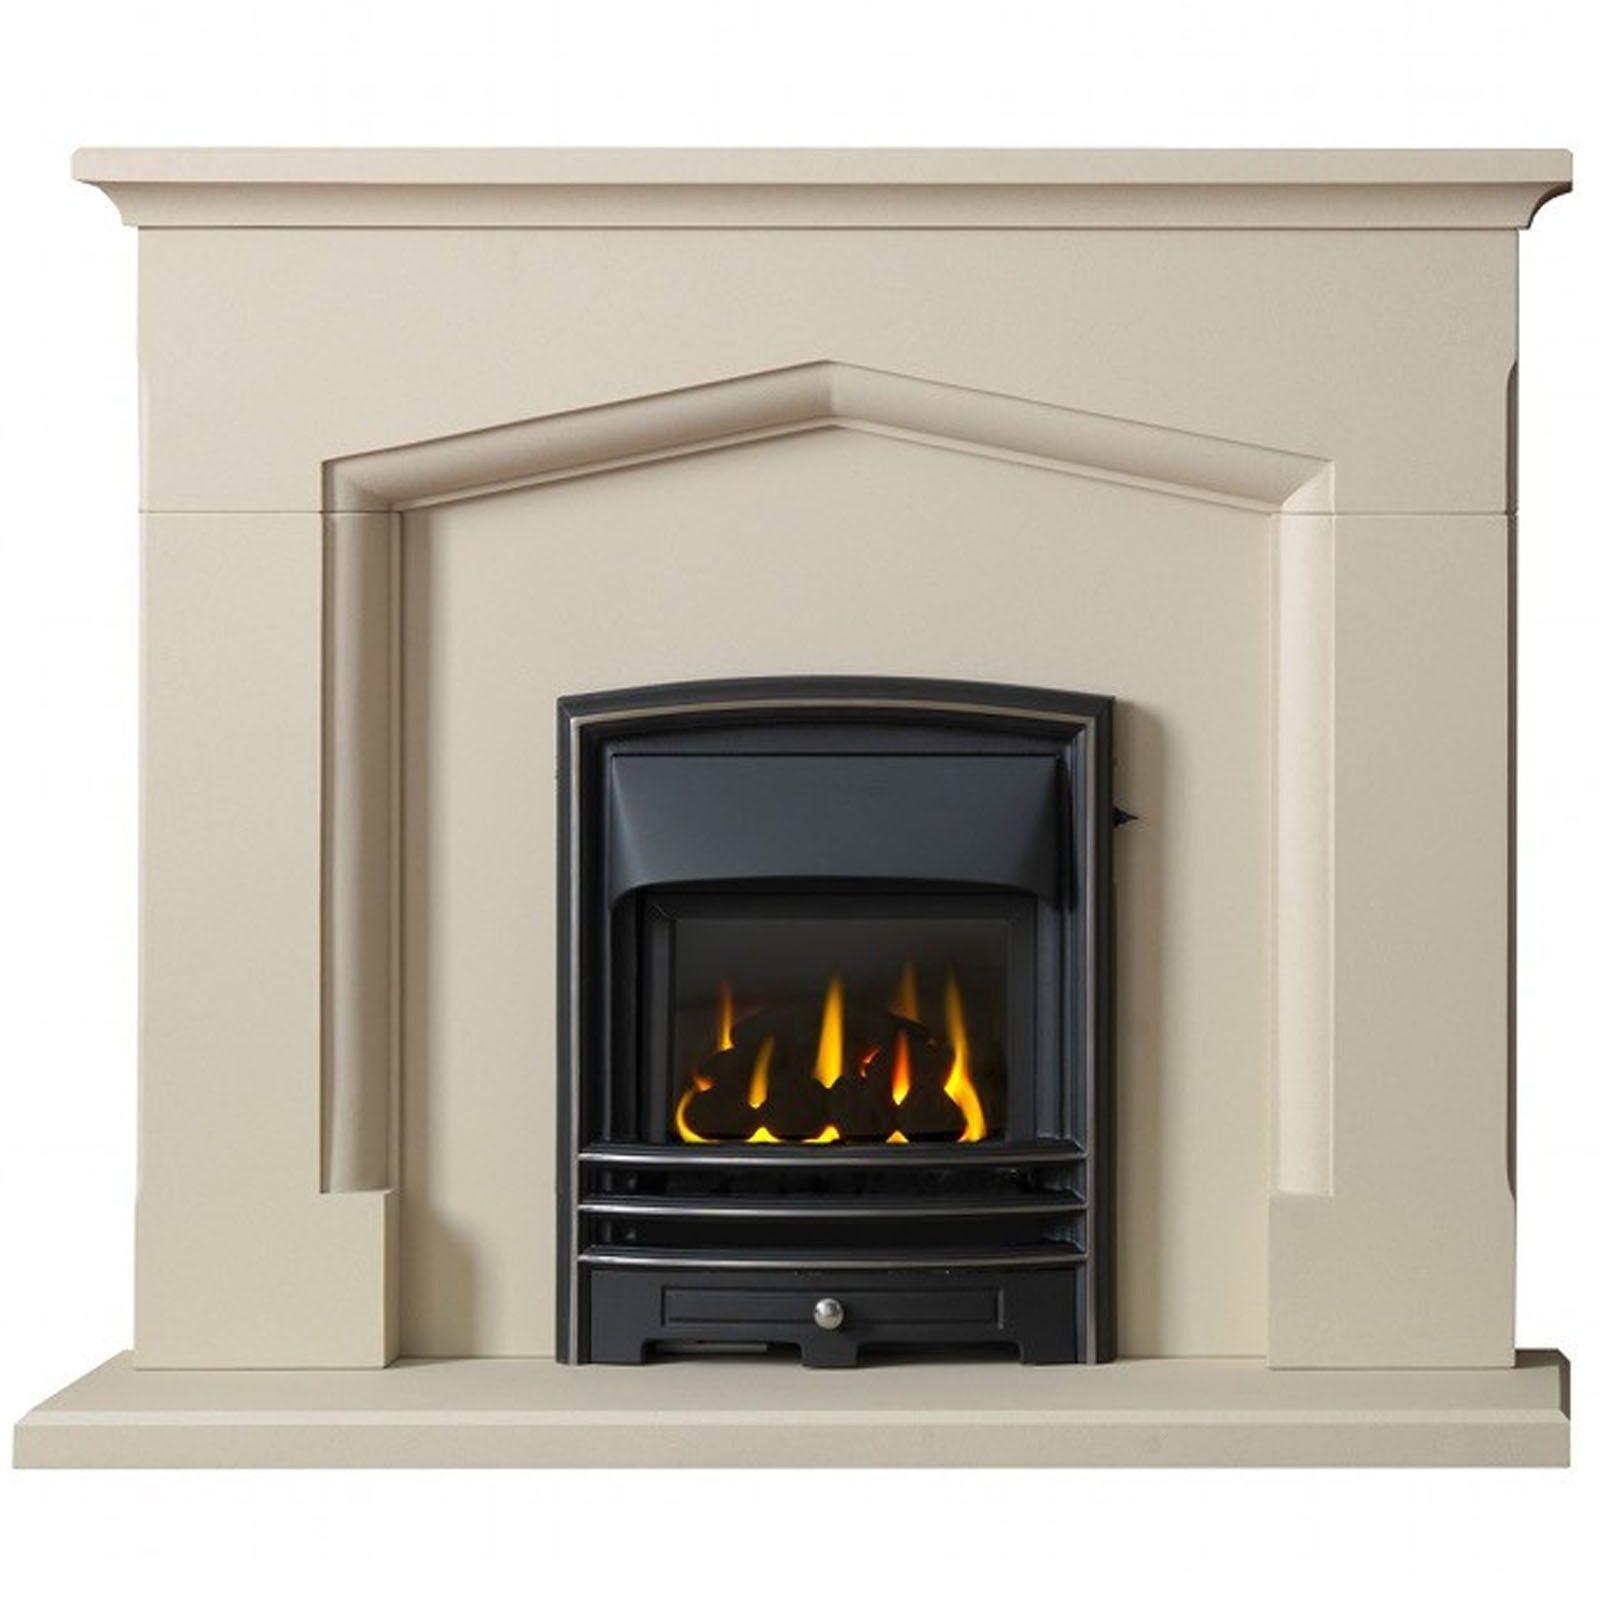 Gallery coniston jurastone fireplace suite tremendous